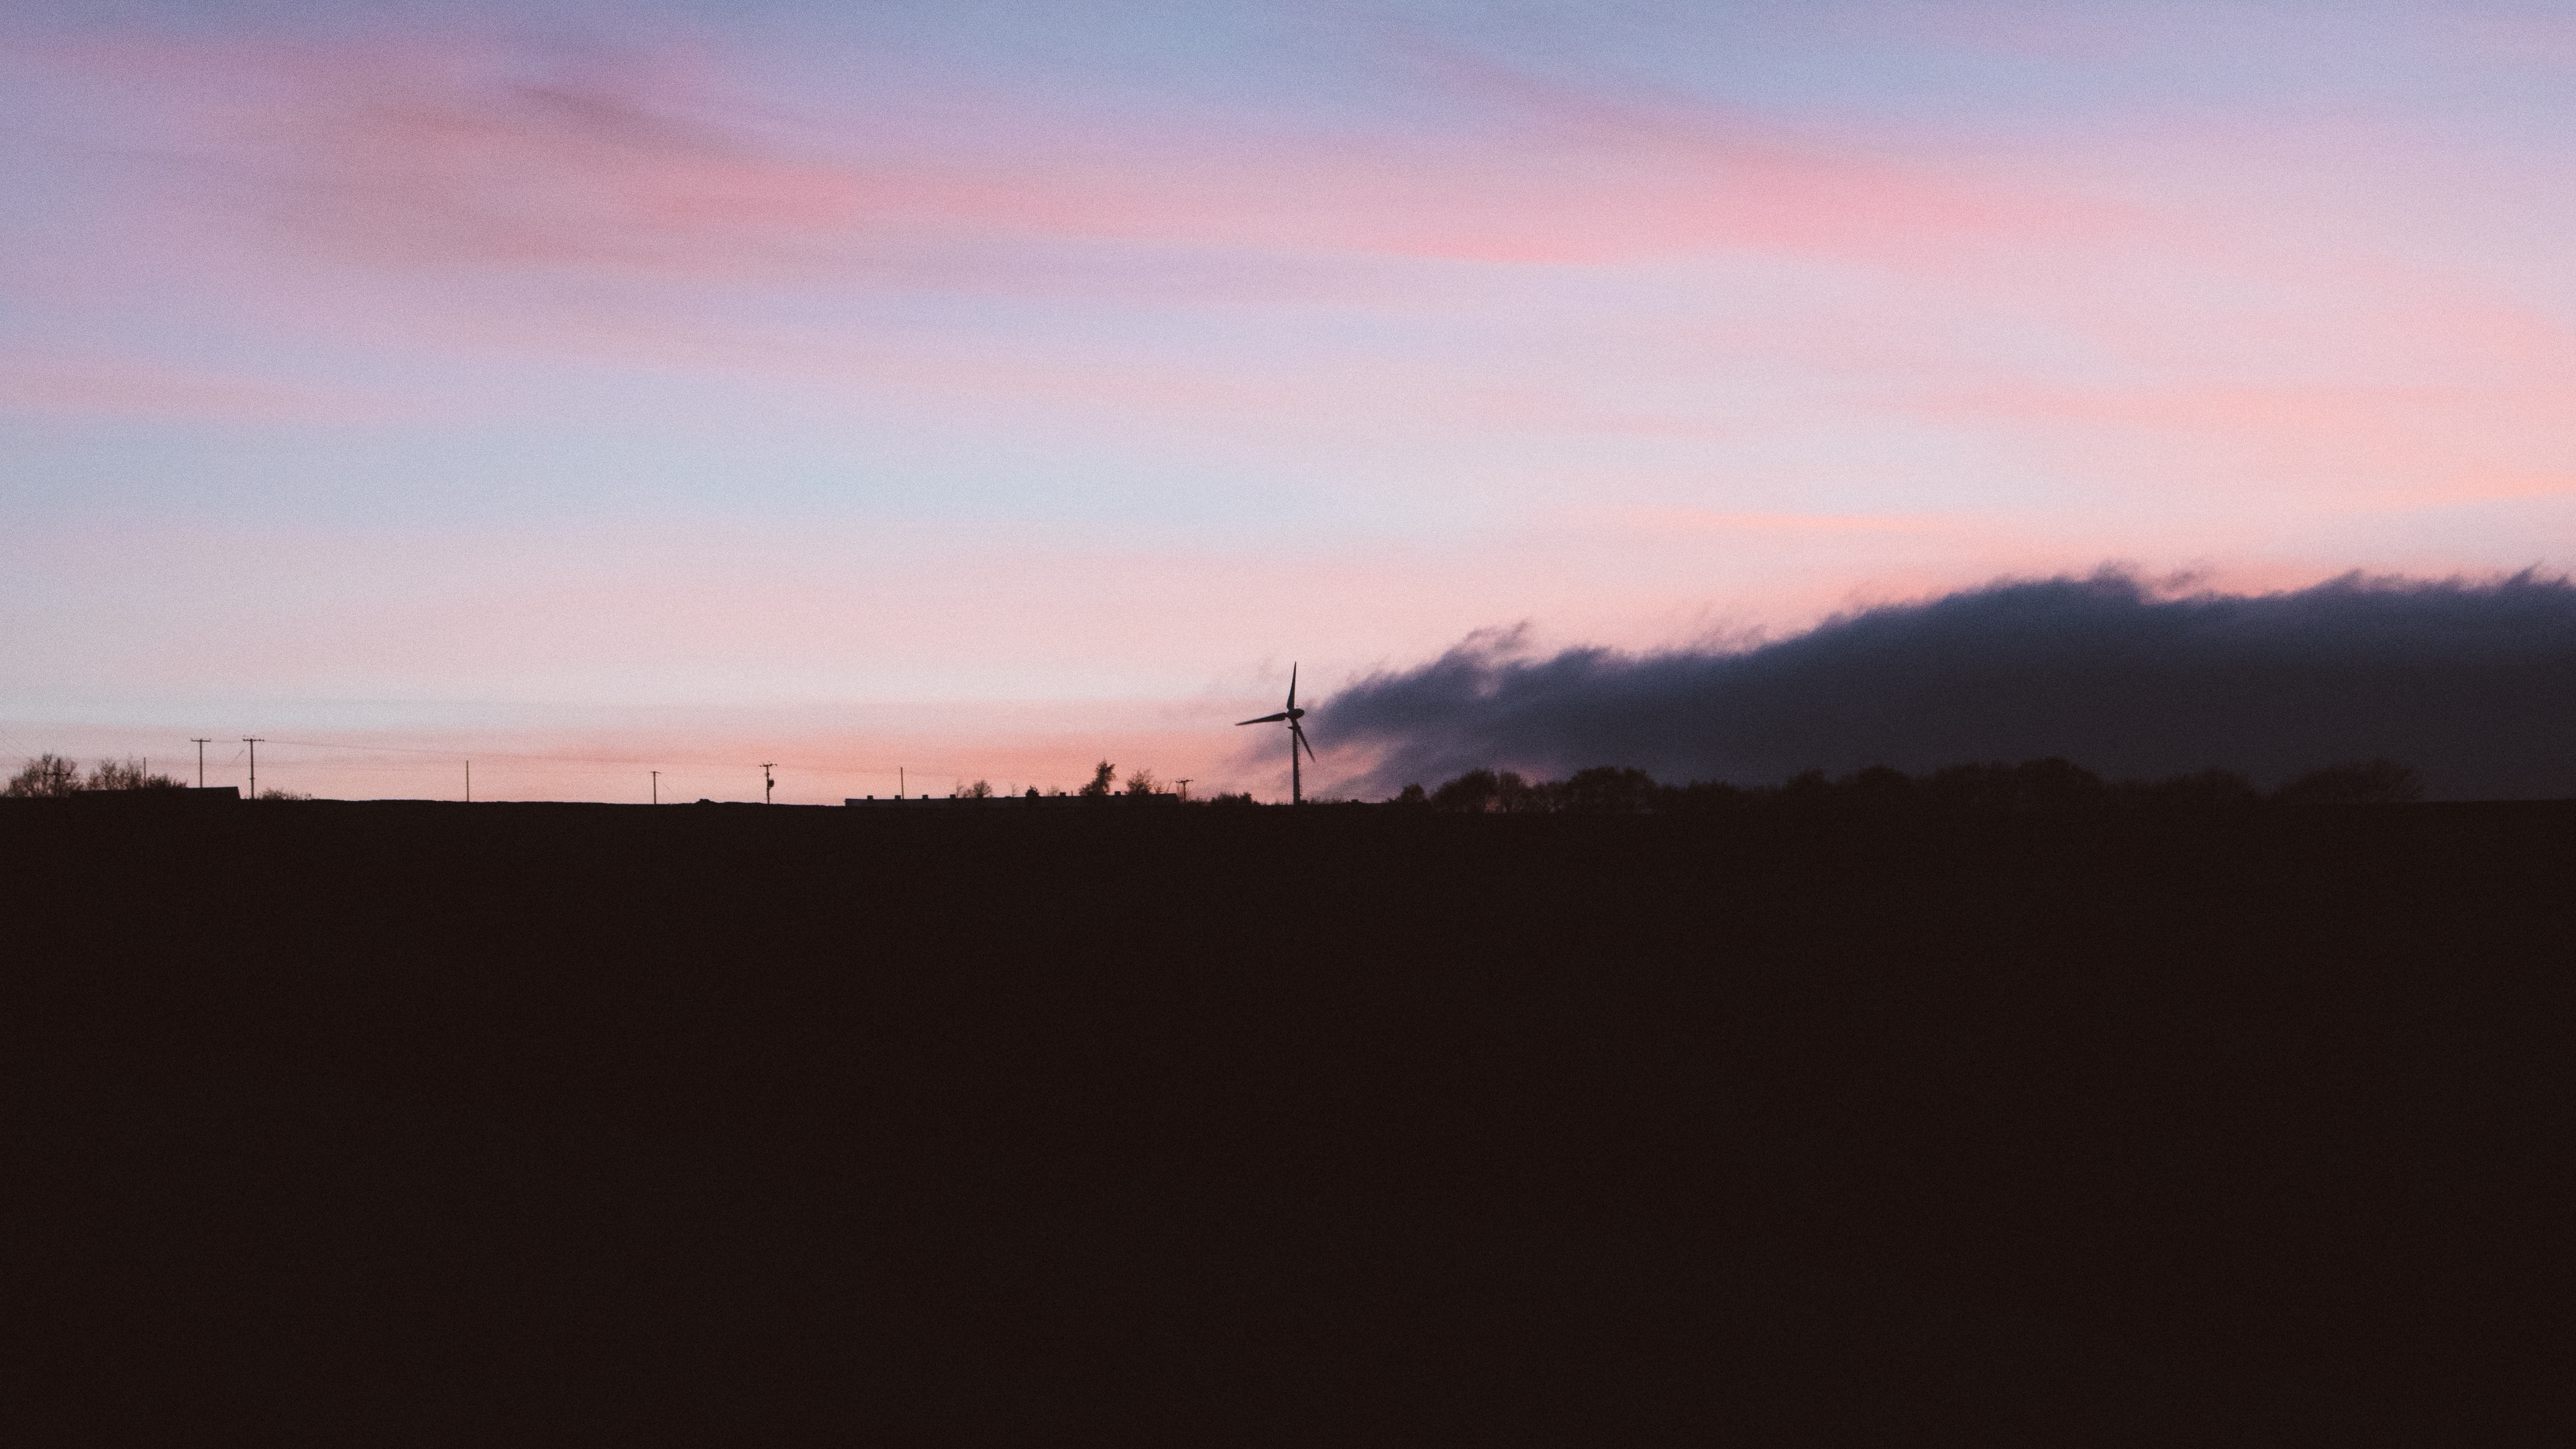 sunset sky wind generator 4k 1540574449 - sunset, sky, wind generator 4k - wind generator, sunset, Sky